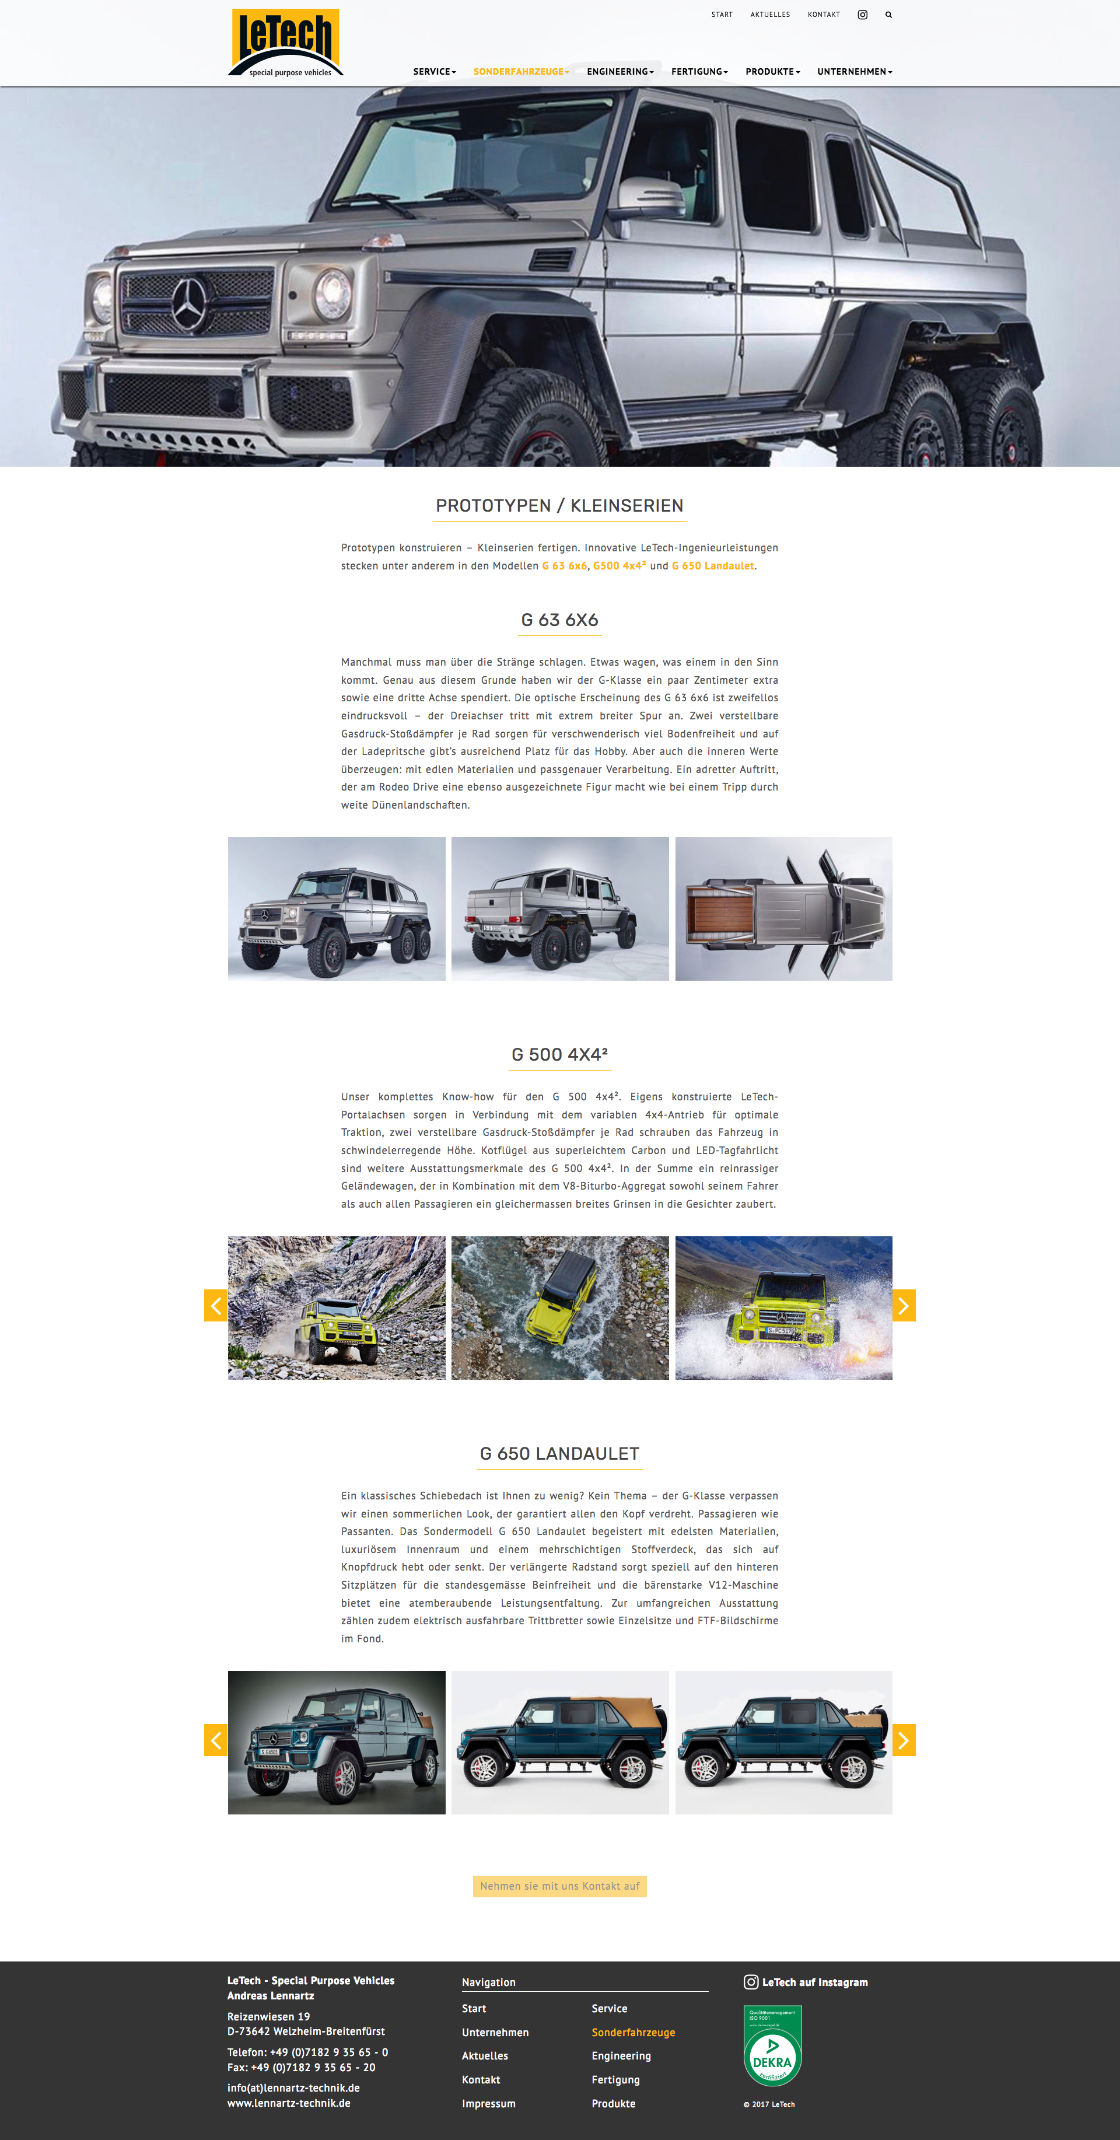 LeTech | Lennartz Technik